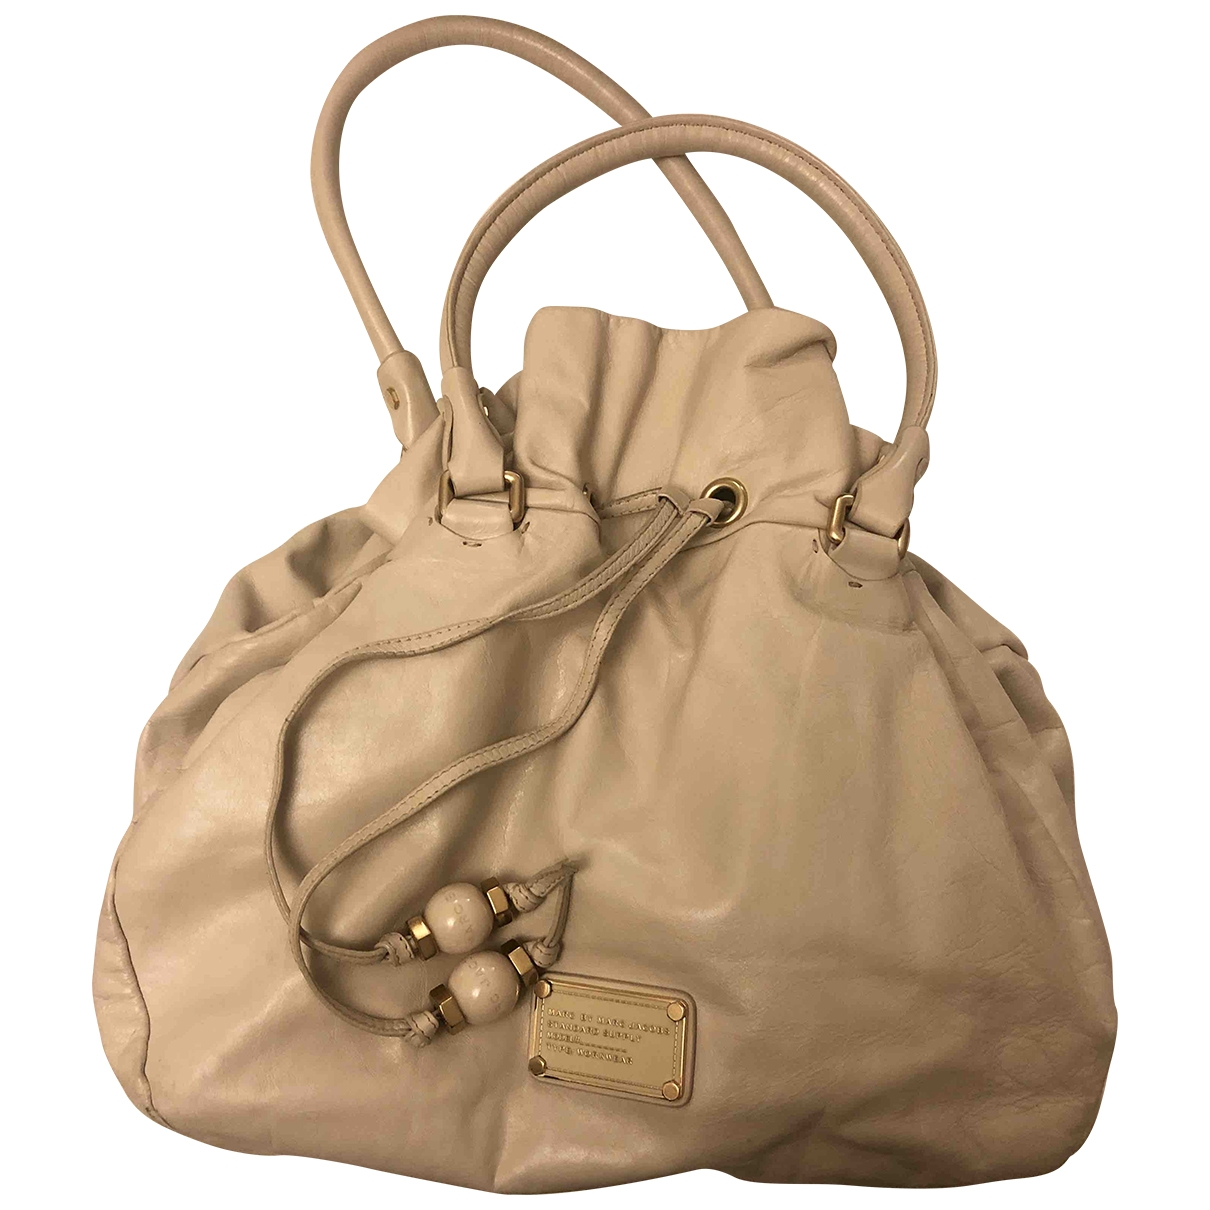 Marc By Marc Jacobs \N Beige Leather handbag for Women \N